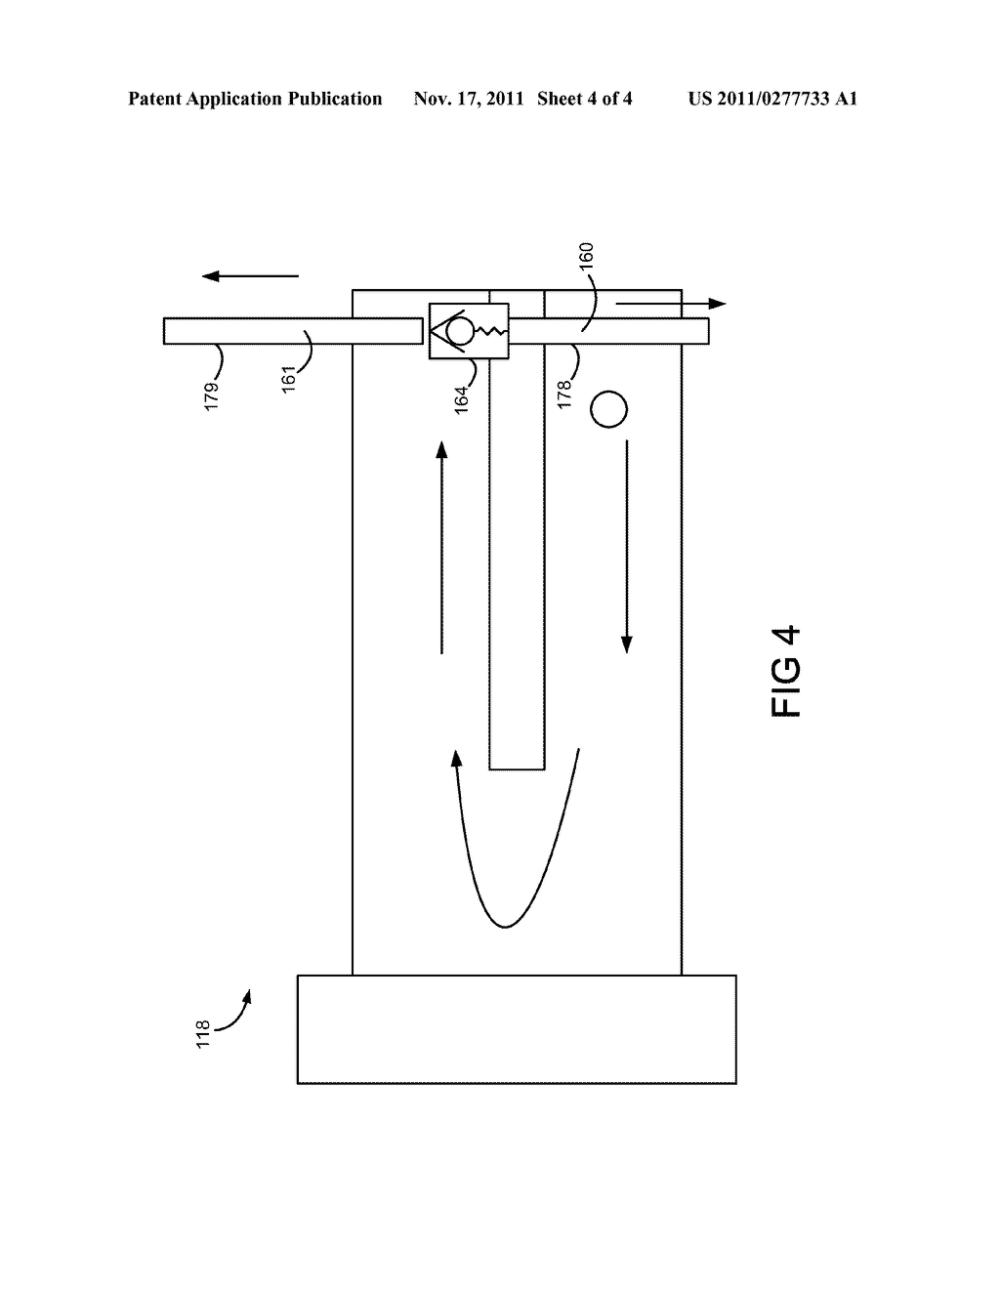 medium resolution of engine including positive crankcase ventilation diagram schematic and image 05